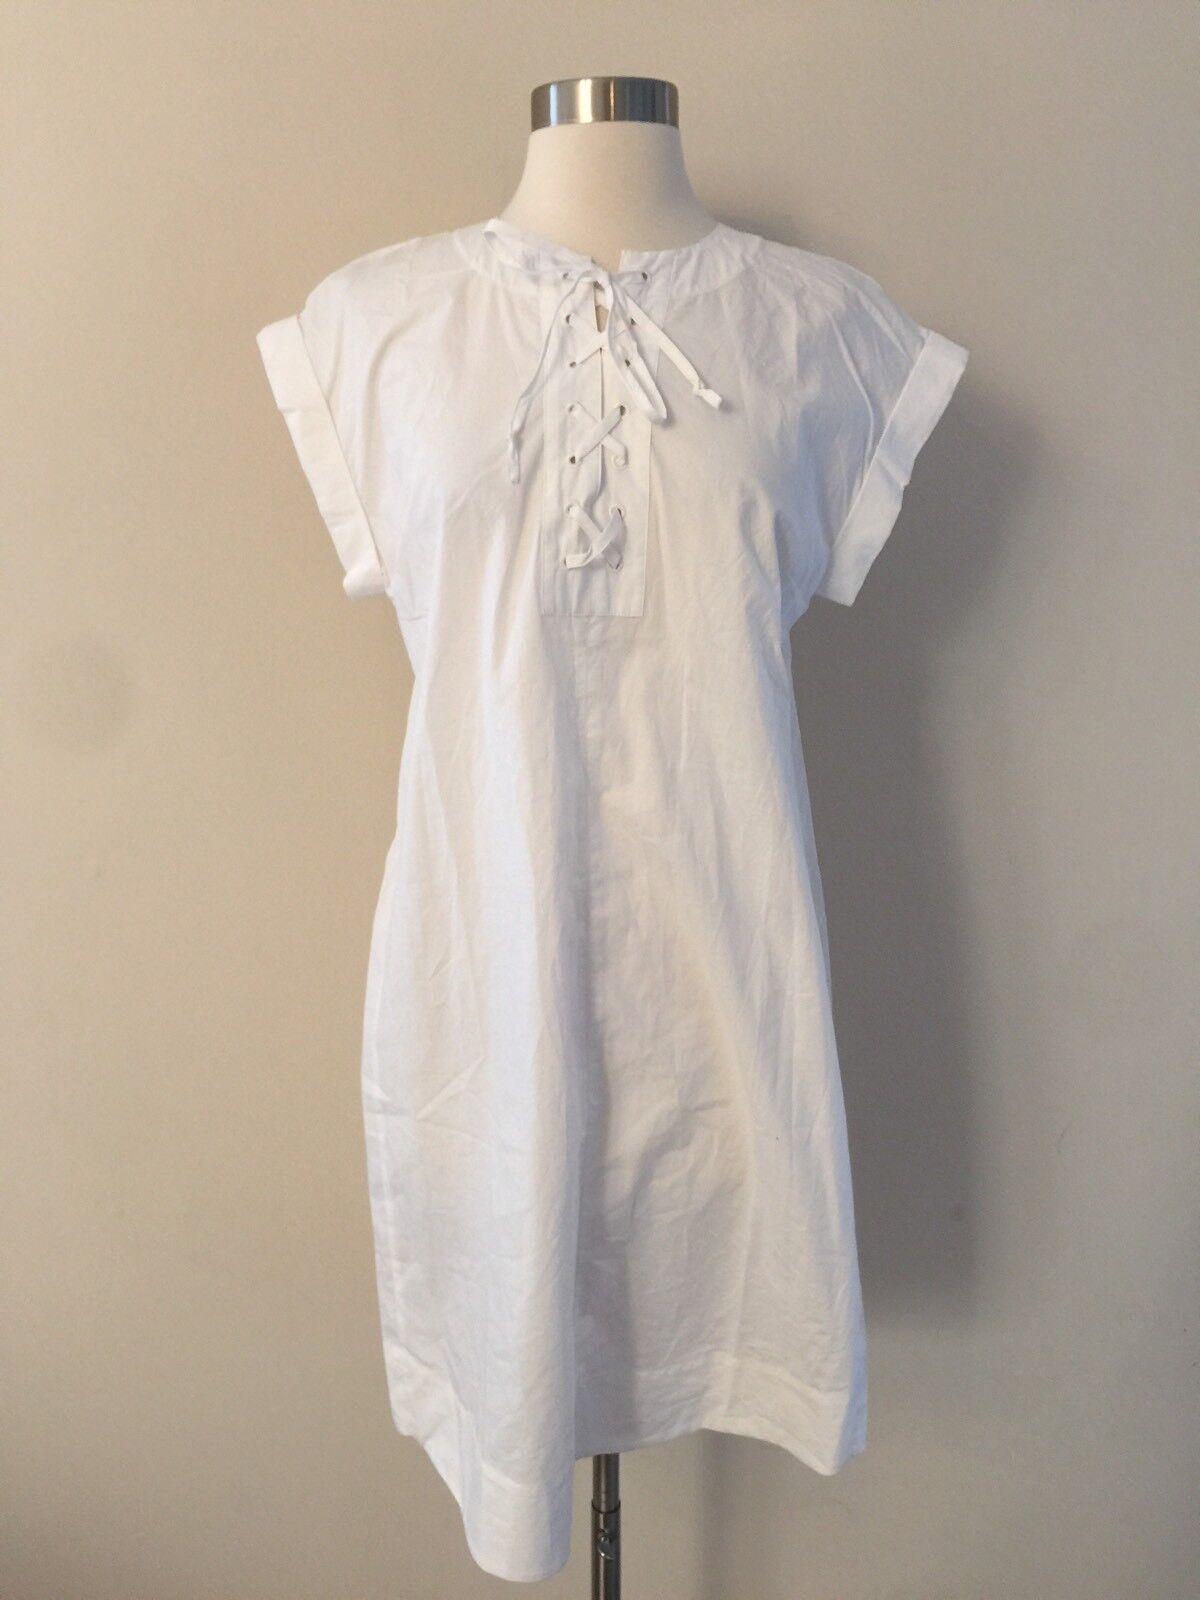 NEW Jcrew Tall Lace Up Cotton Shirt Dress White G6001 SUMMER 2017 SIZE TS